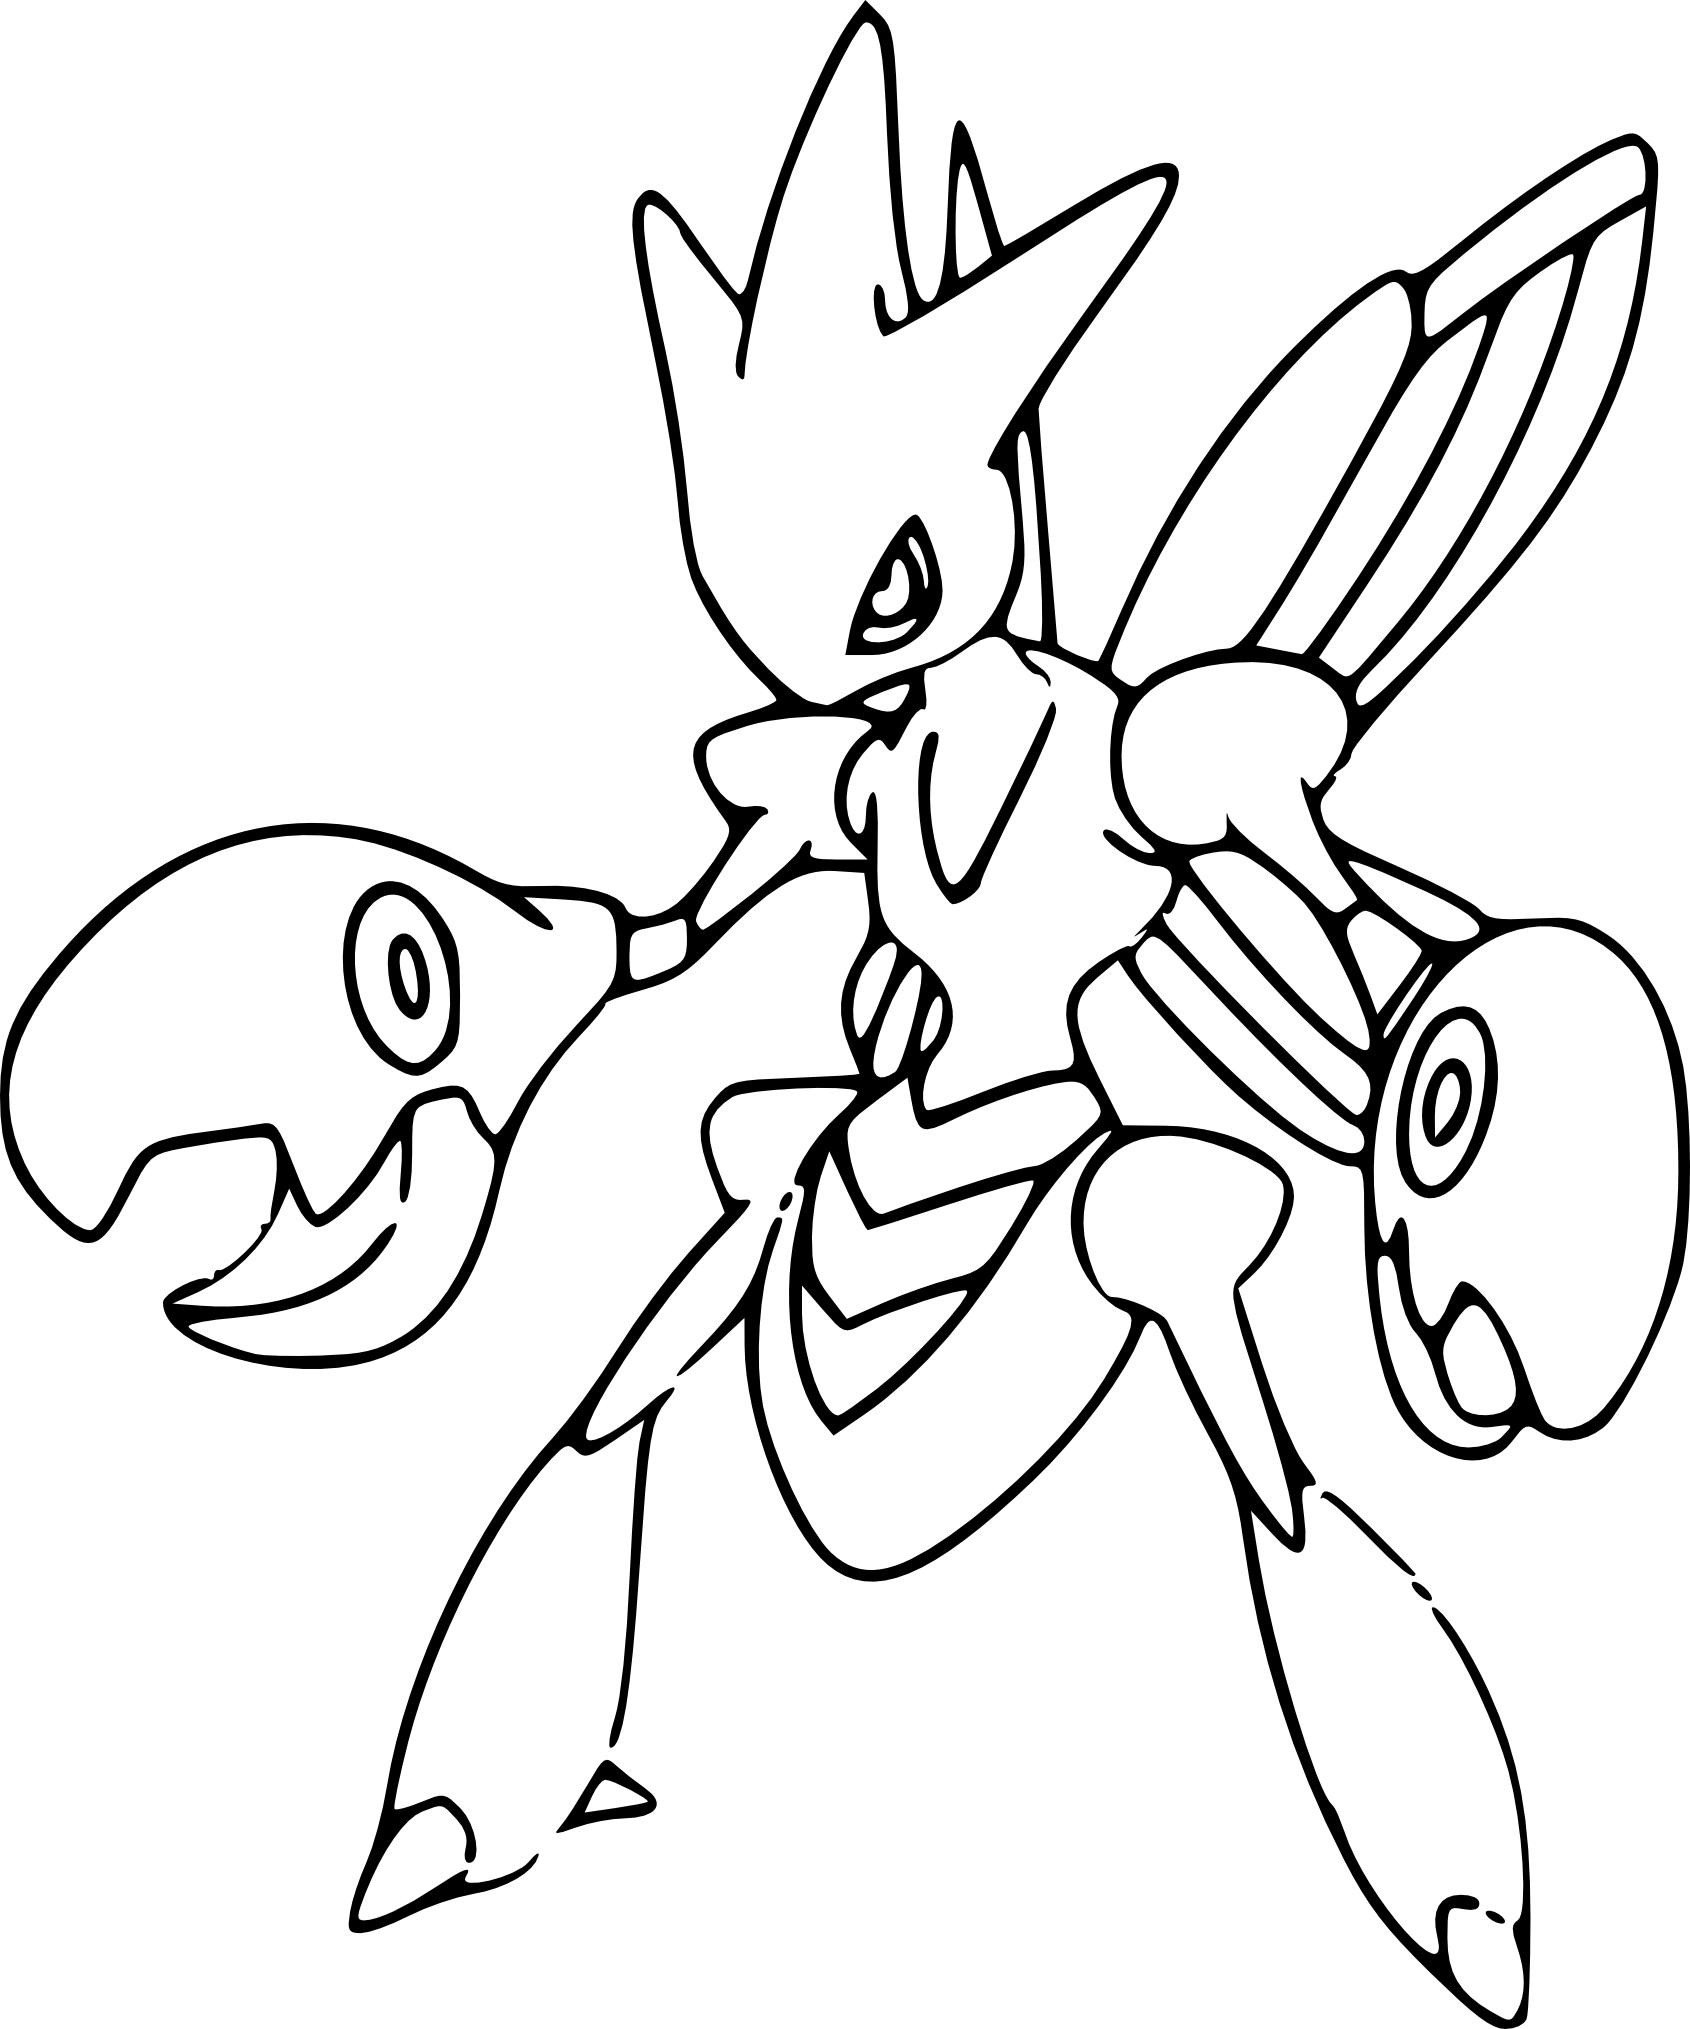 Coloriage cizayox pokemon imprimer - Coloriage pokemon feu ...